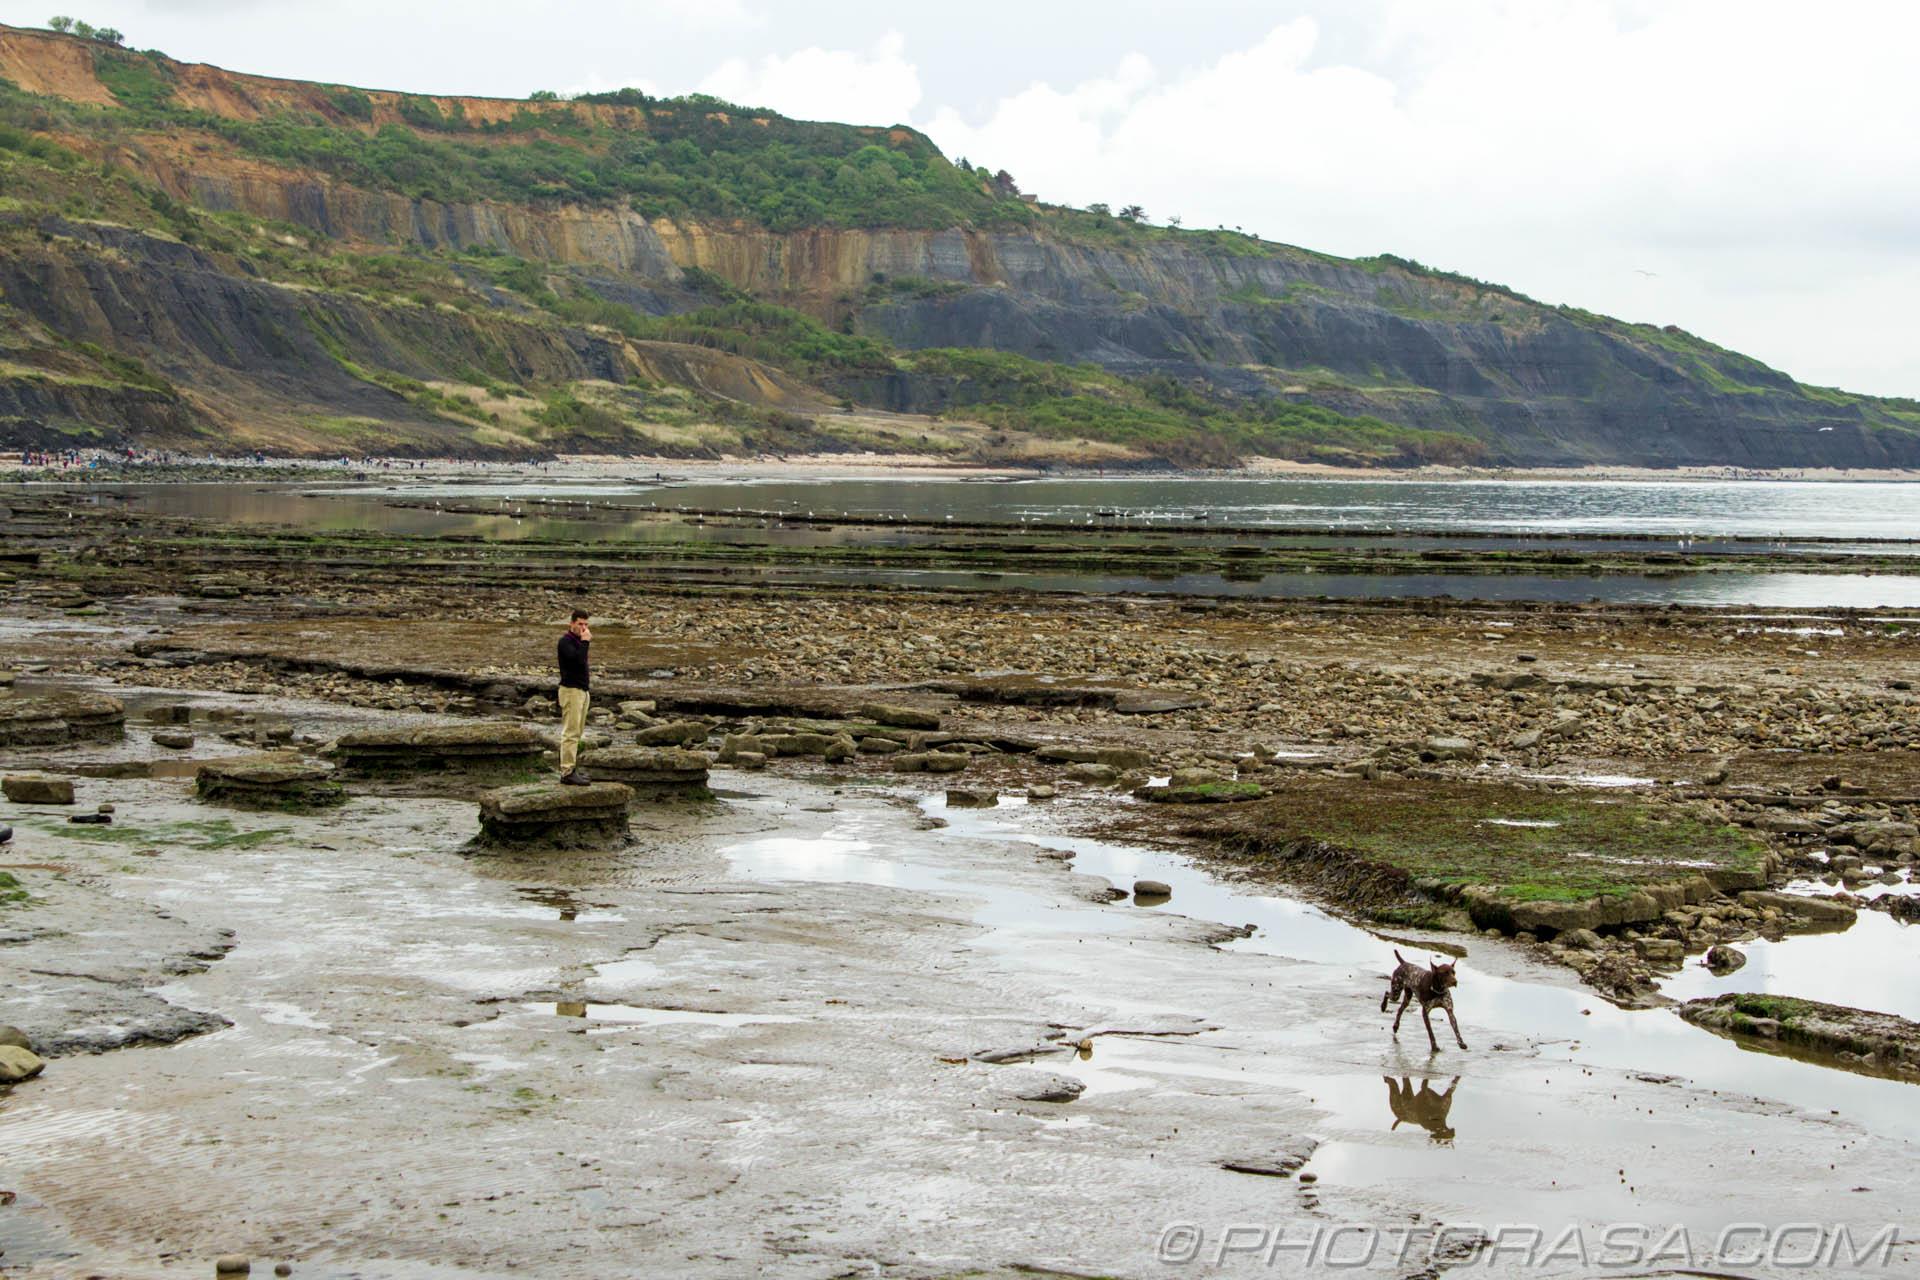 https://photorasa.com/walking-dog-jurassic-coast/dog-galloping-from-his-owner/